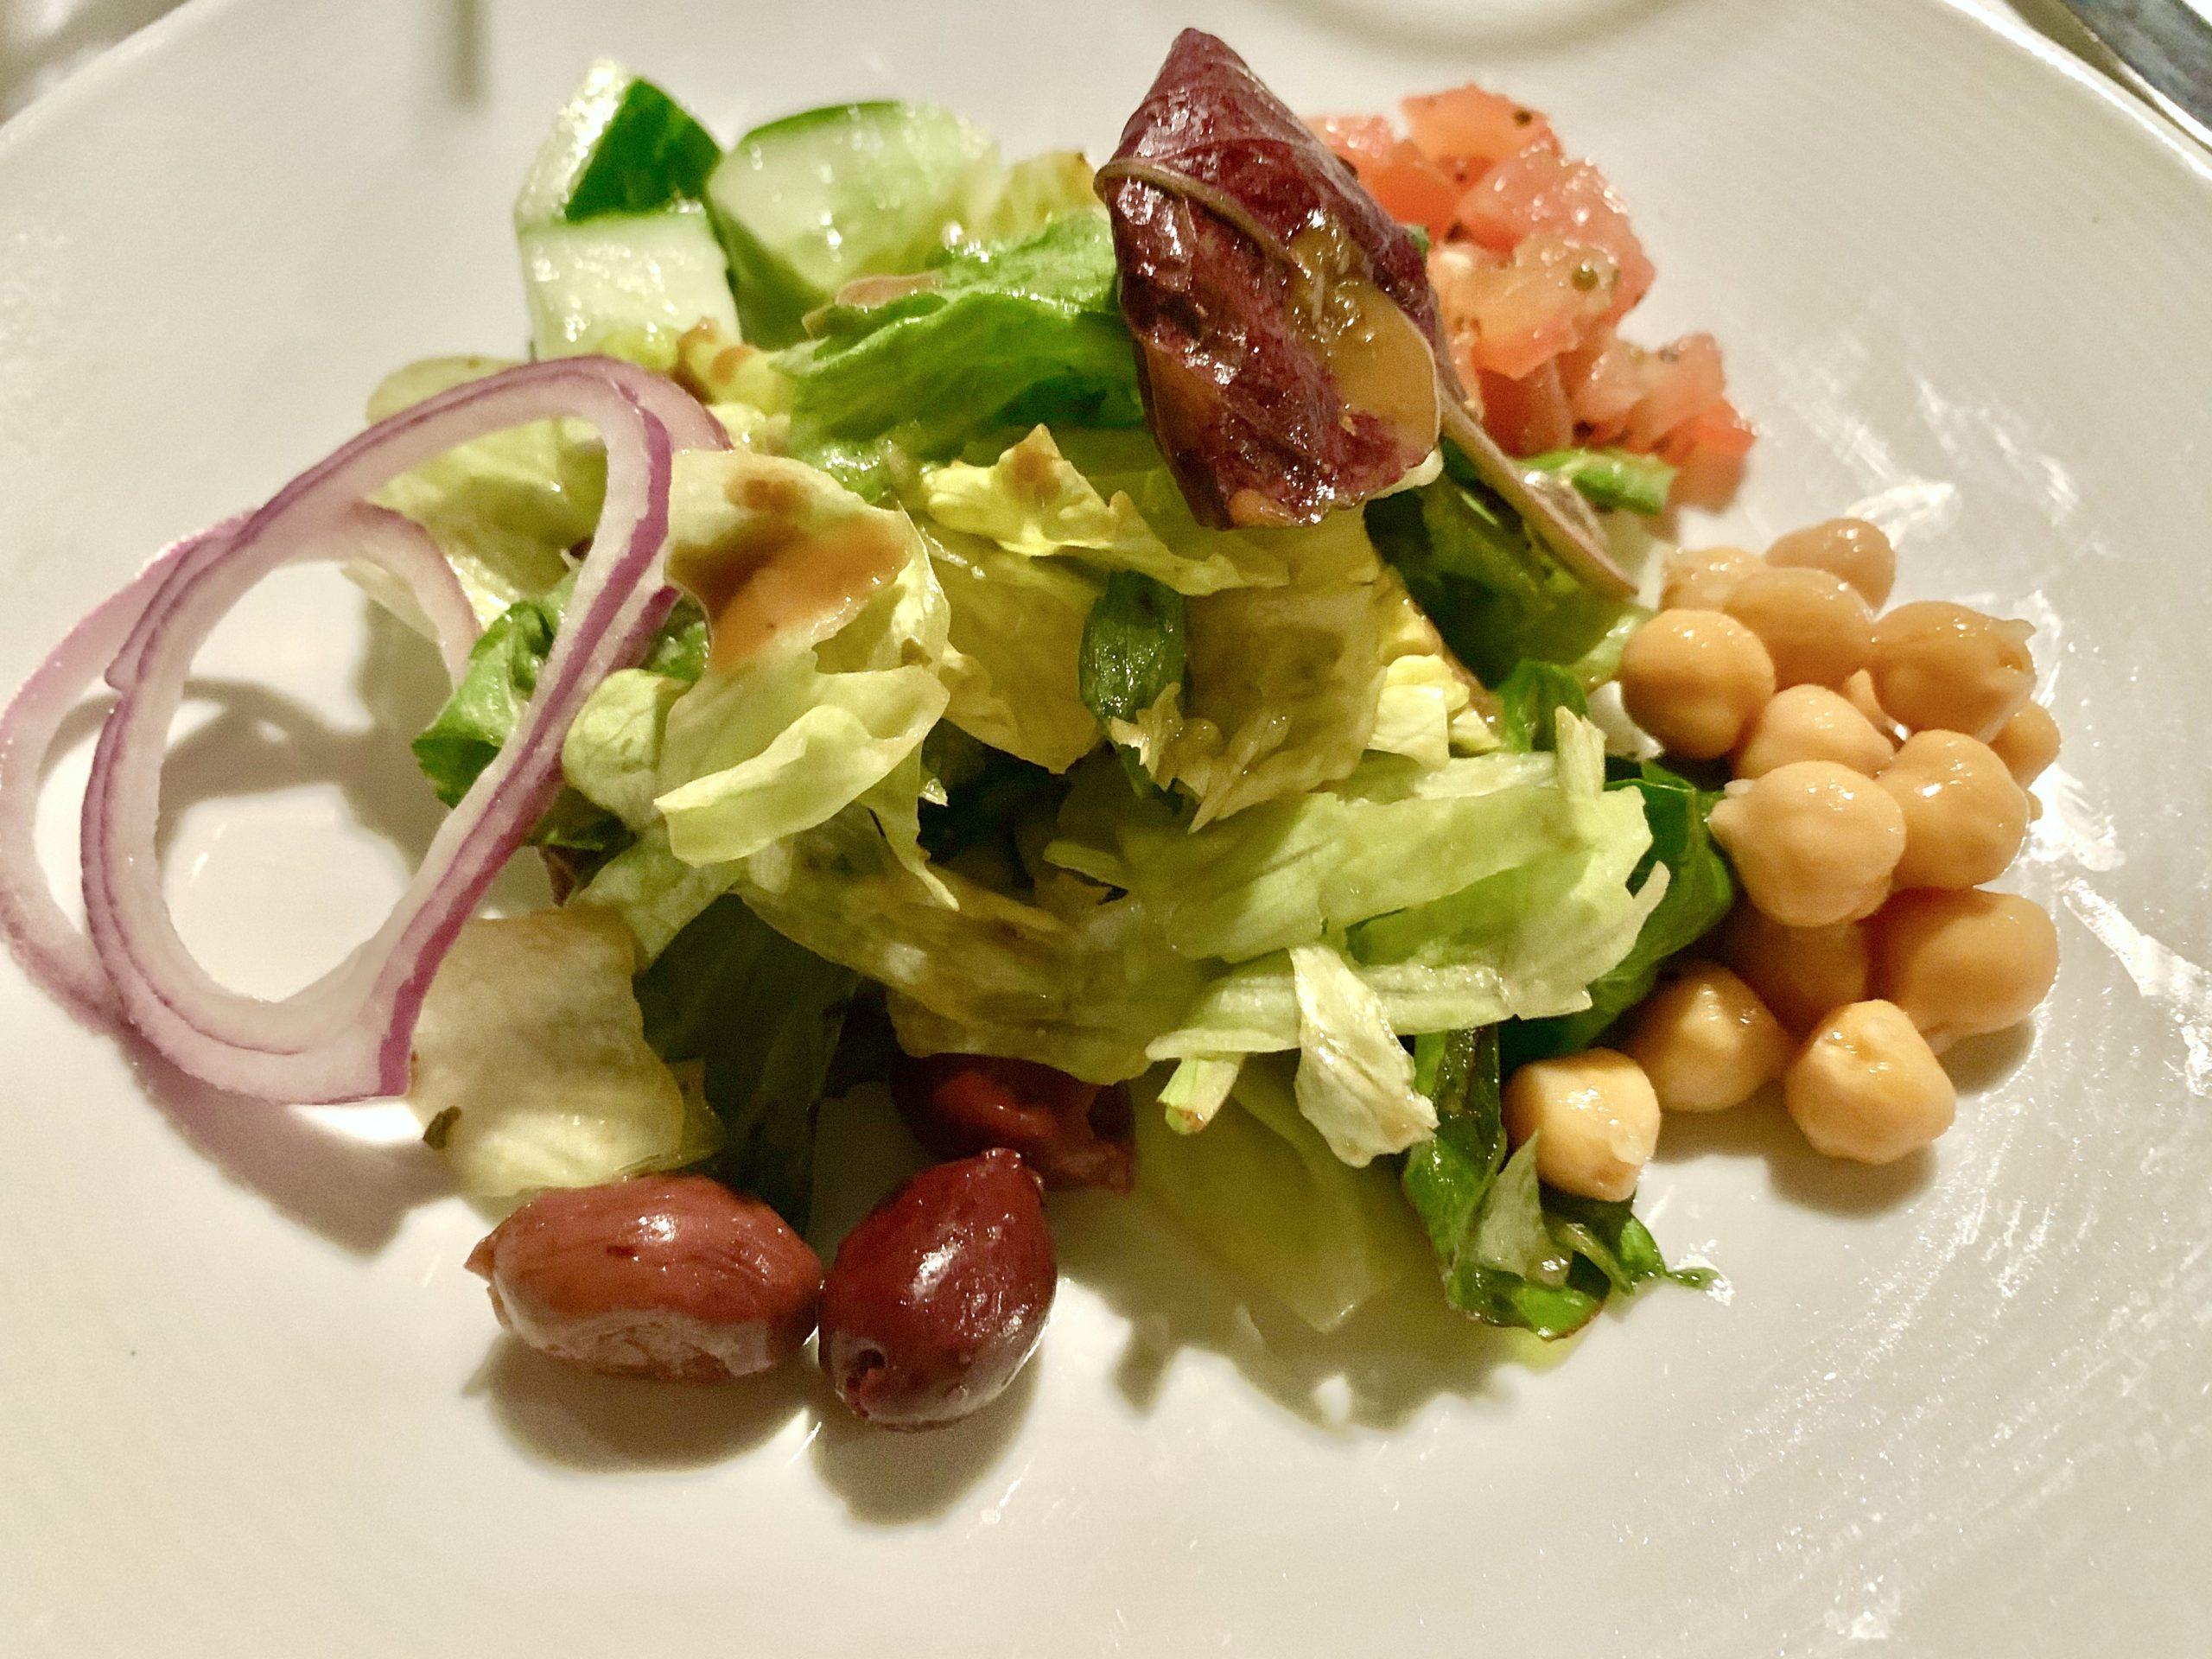 Gratzzi House Salad